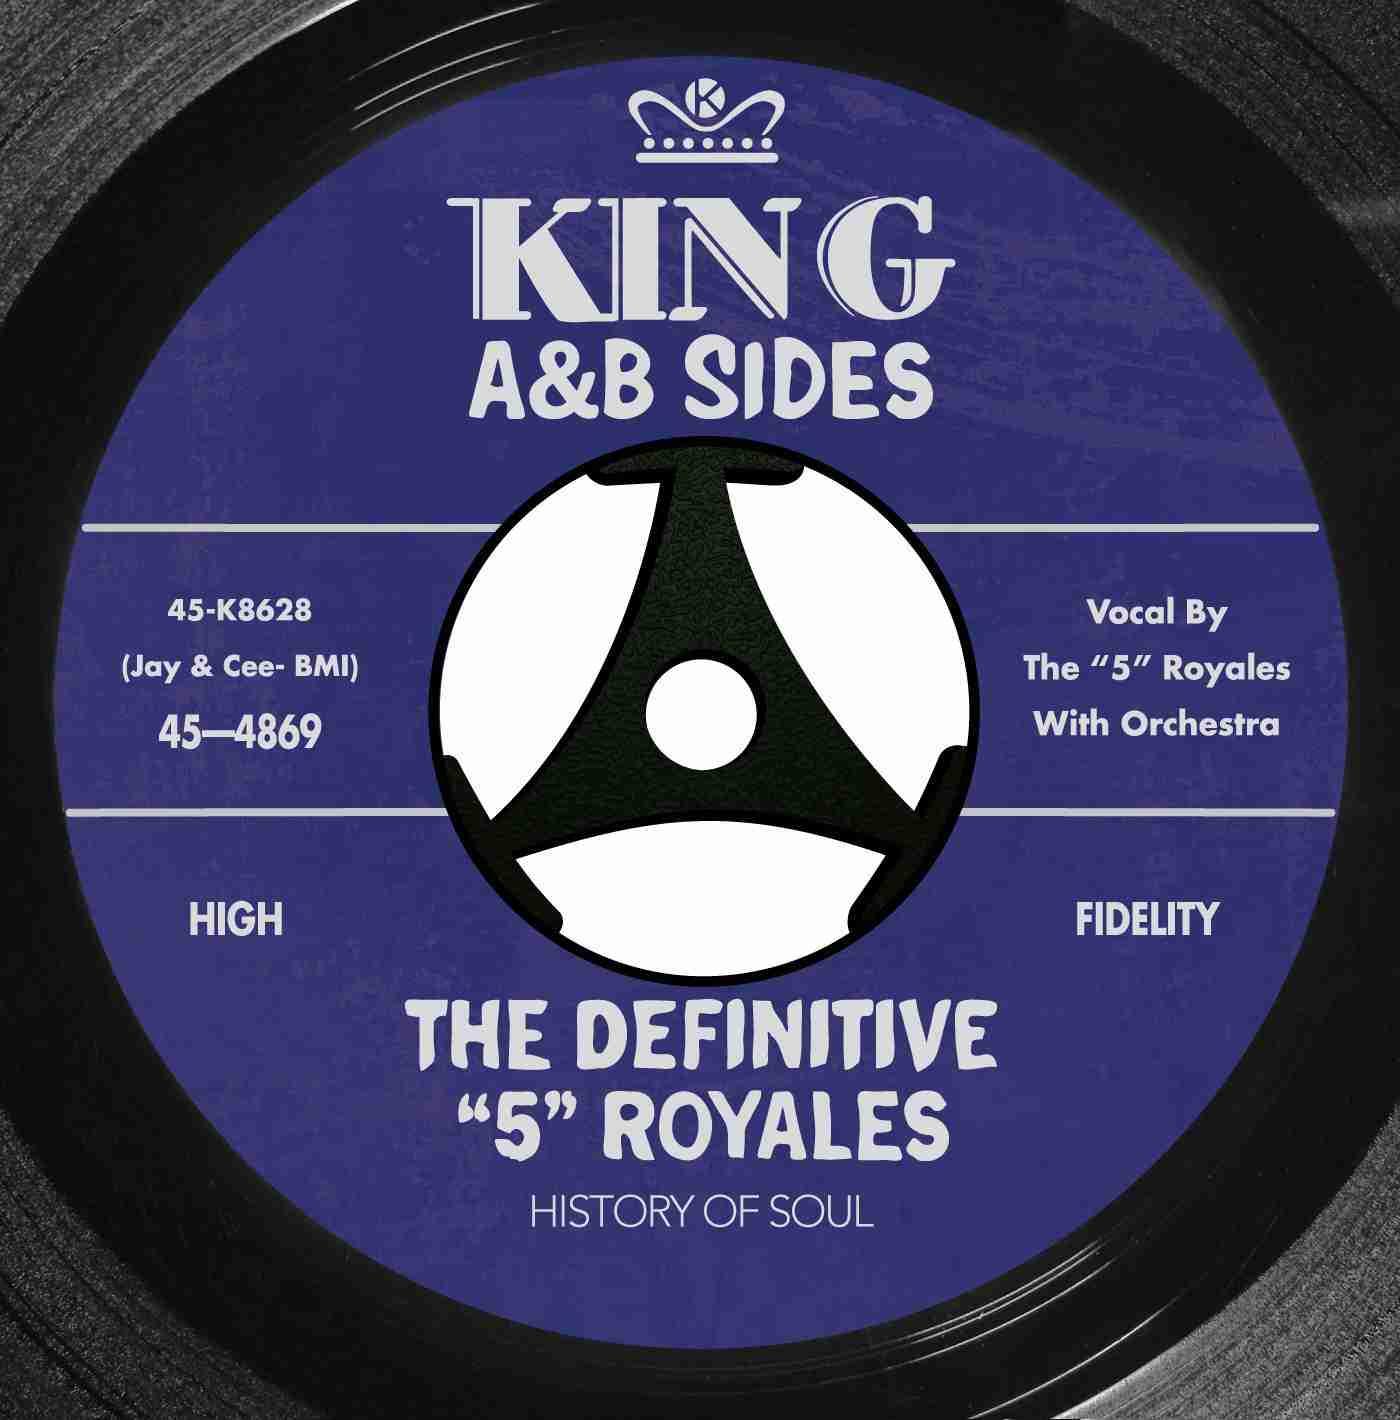 King A&B Sides